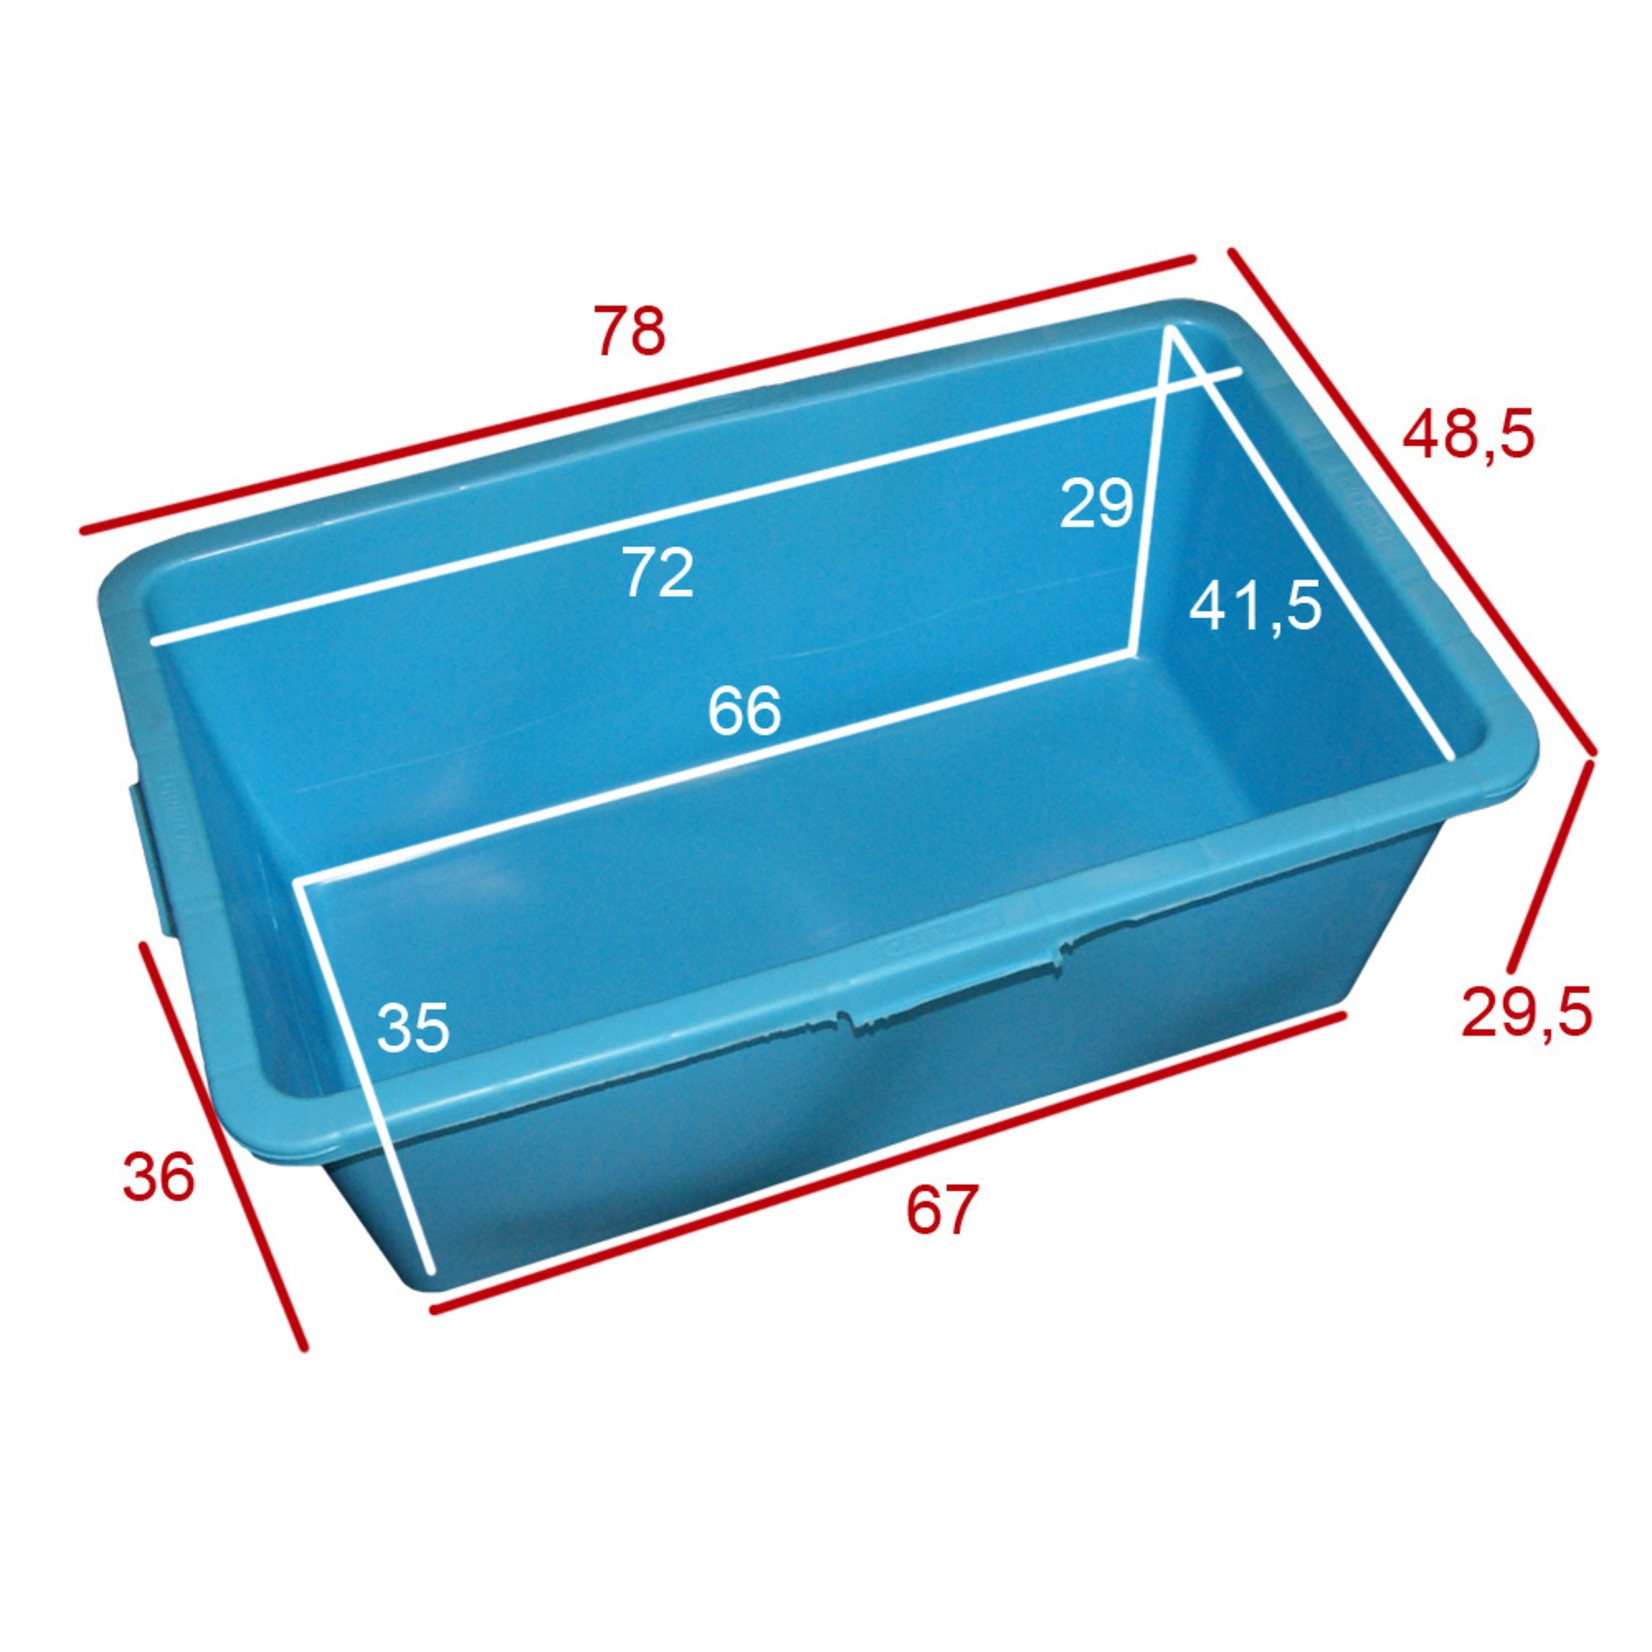 Meuwissen Agro Rechthoek kuip 90 liter blauw l.79 x b.48 x h.30 cm